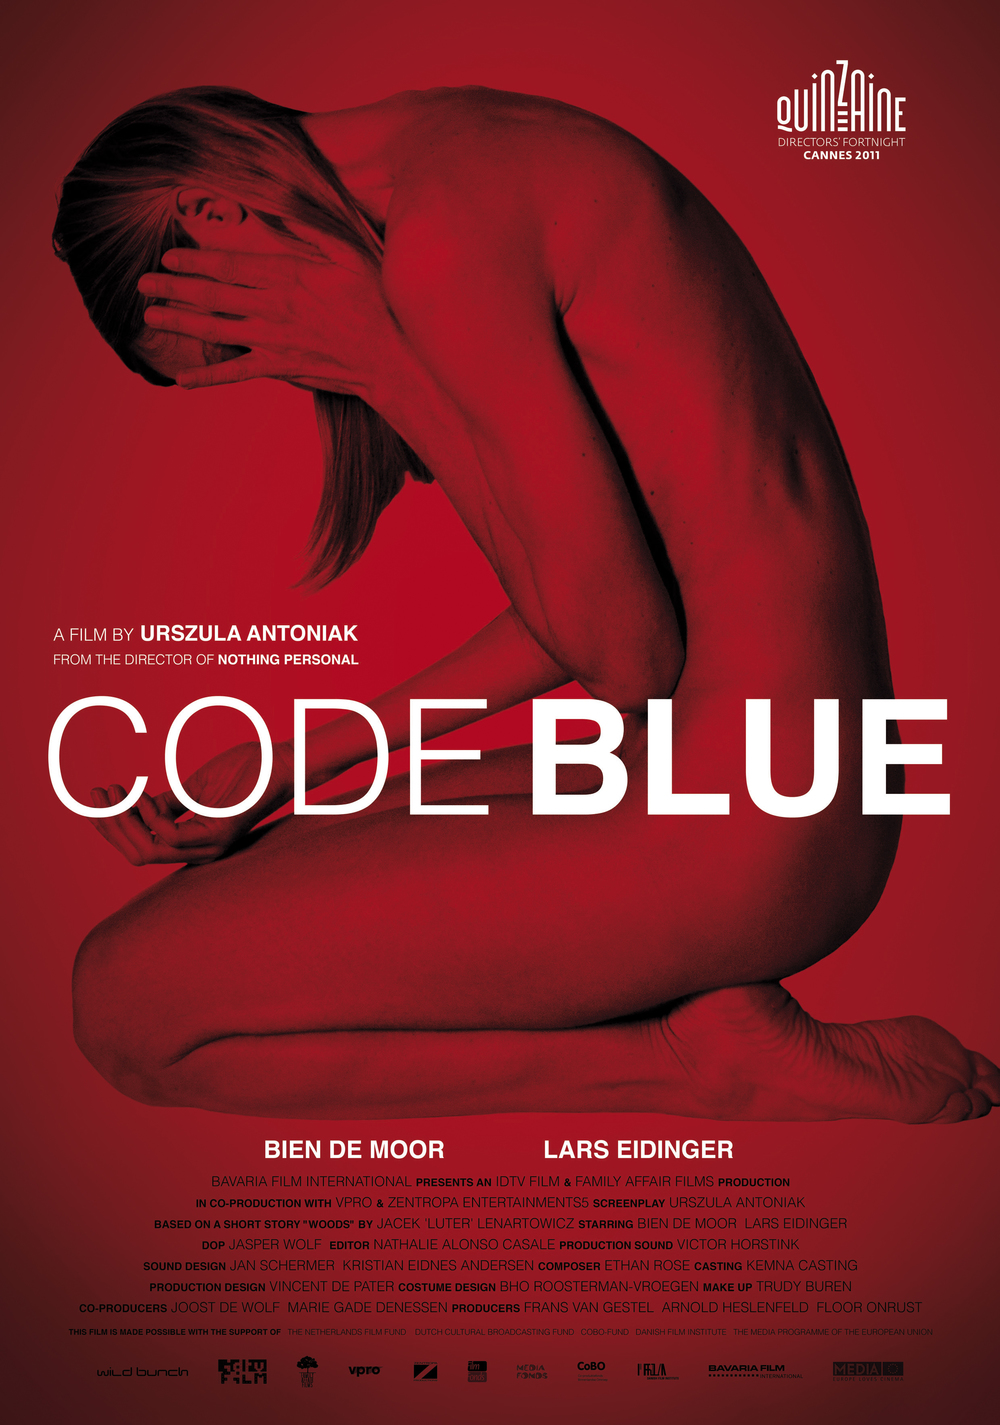 A4-Code Blue.jpg